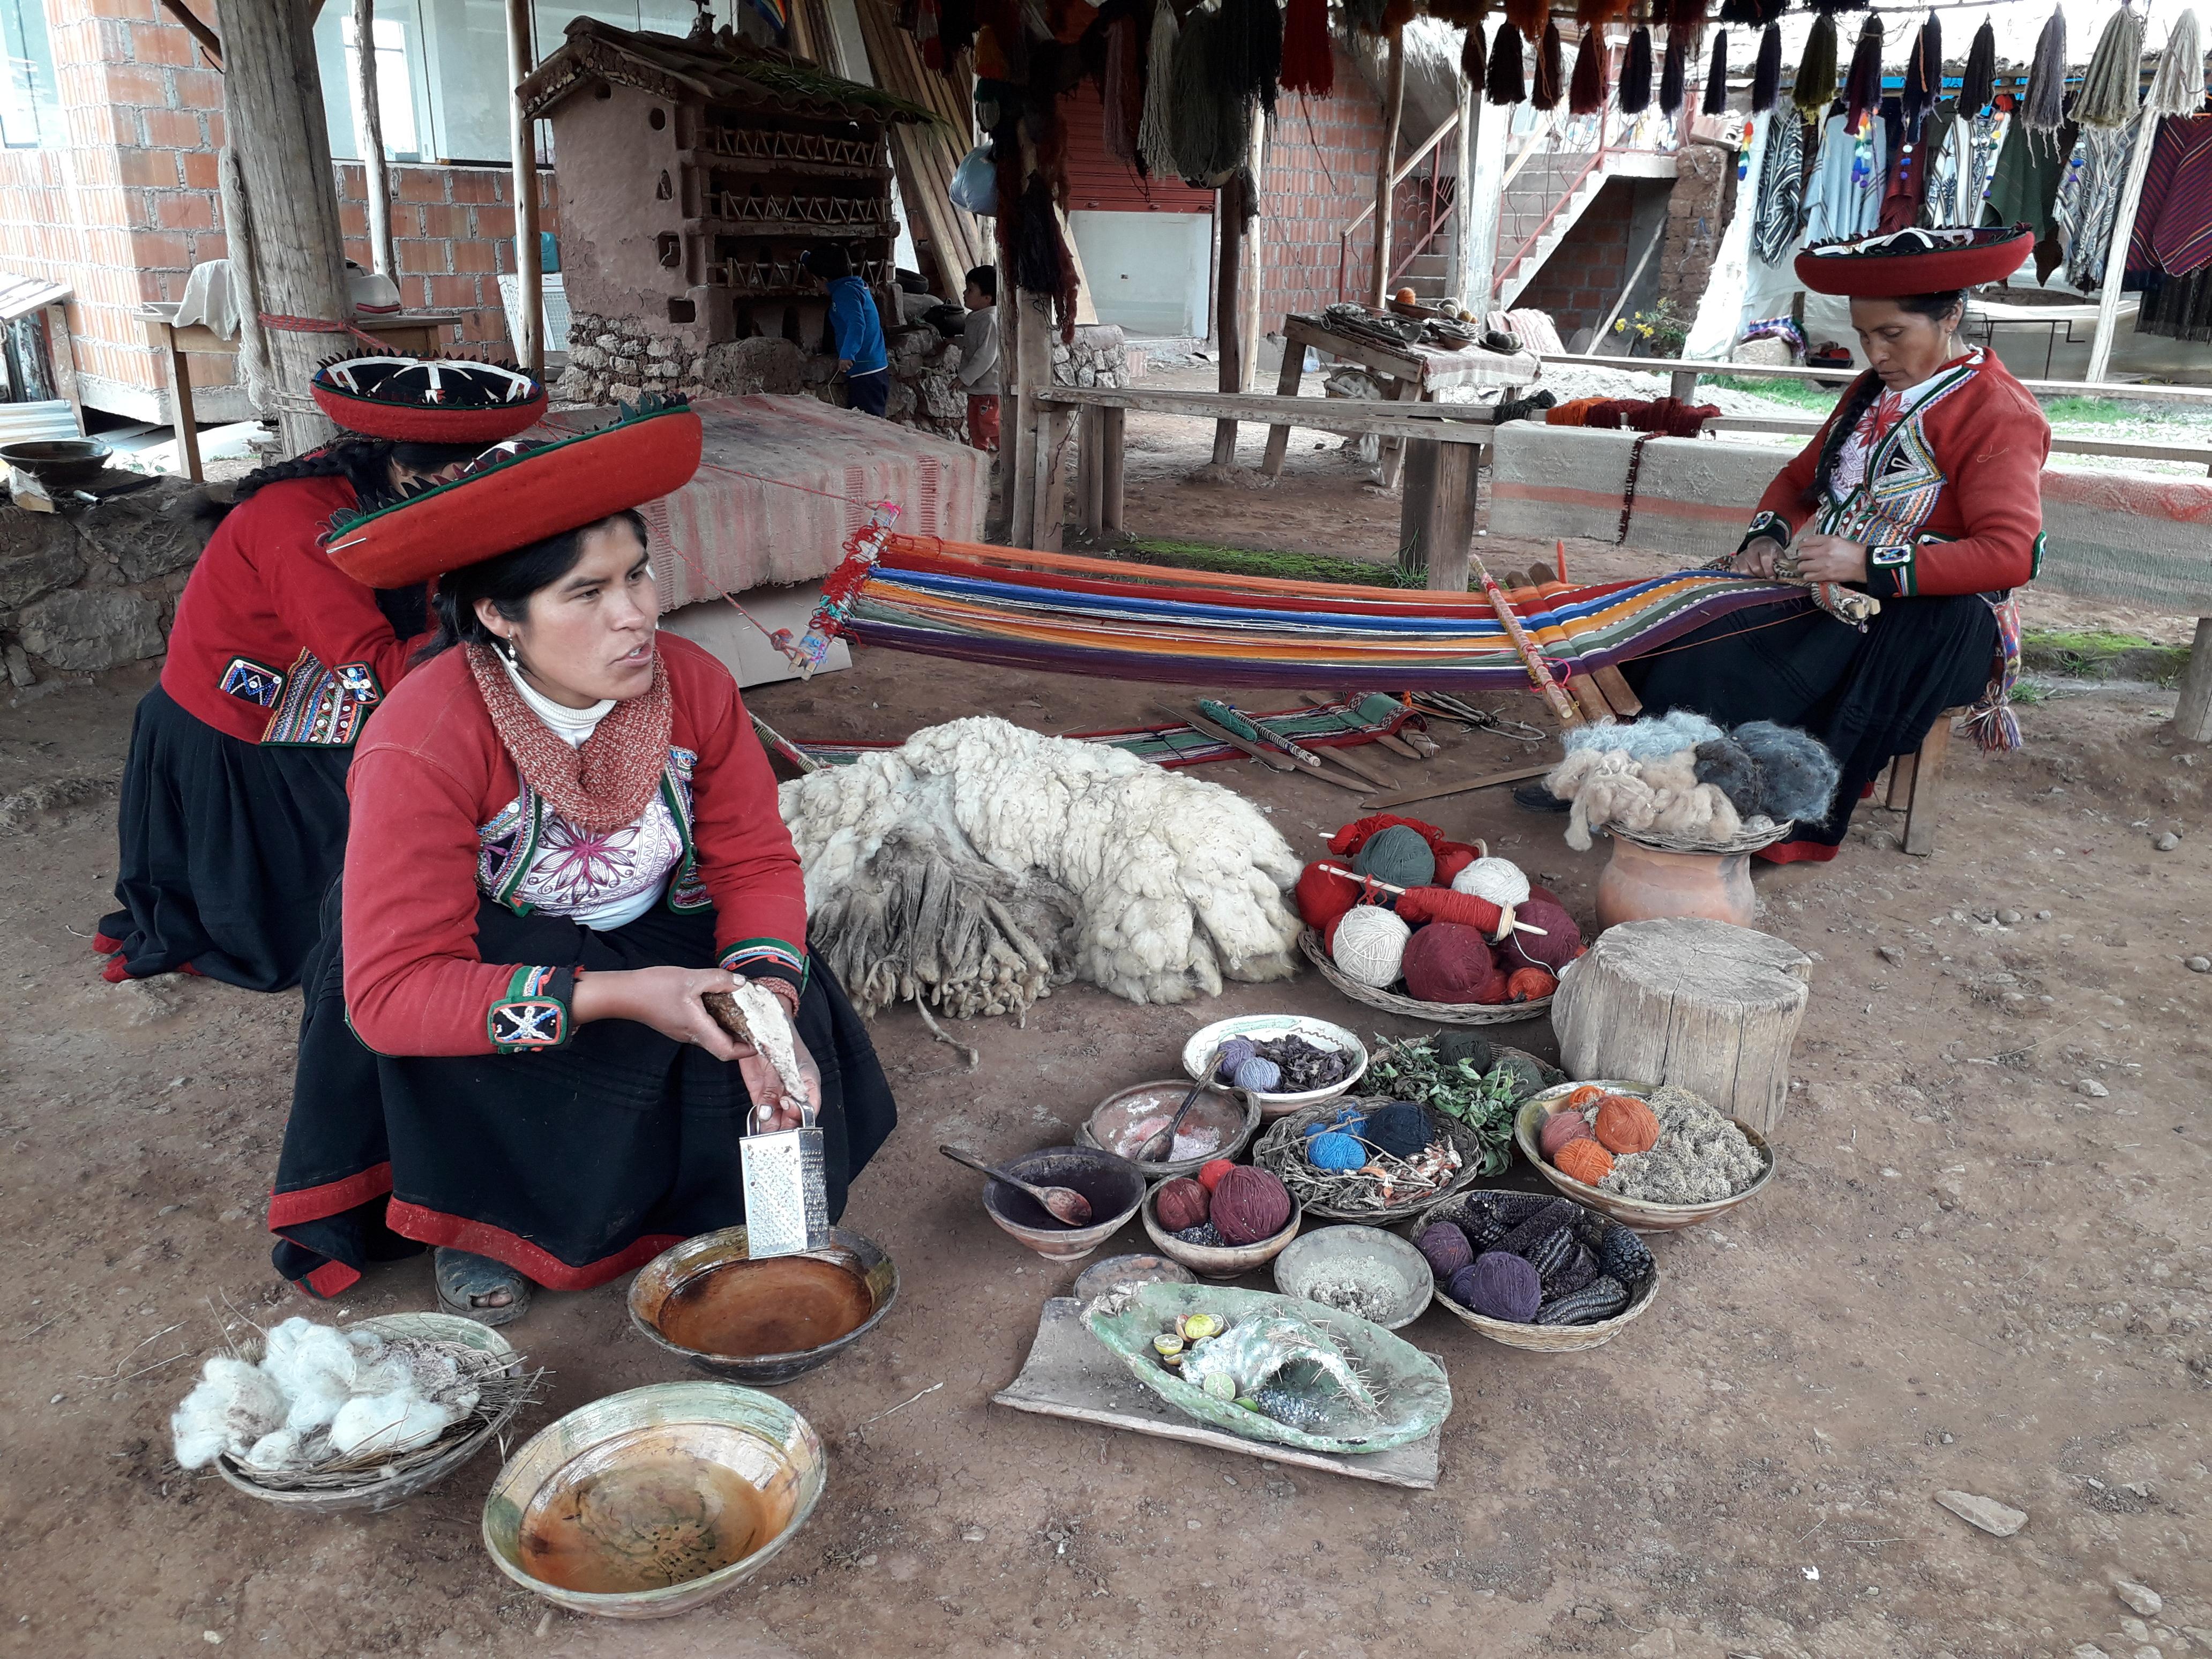 vallee sacree des incas (5)